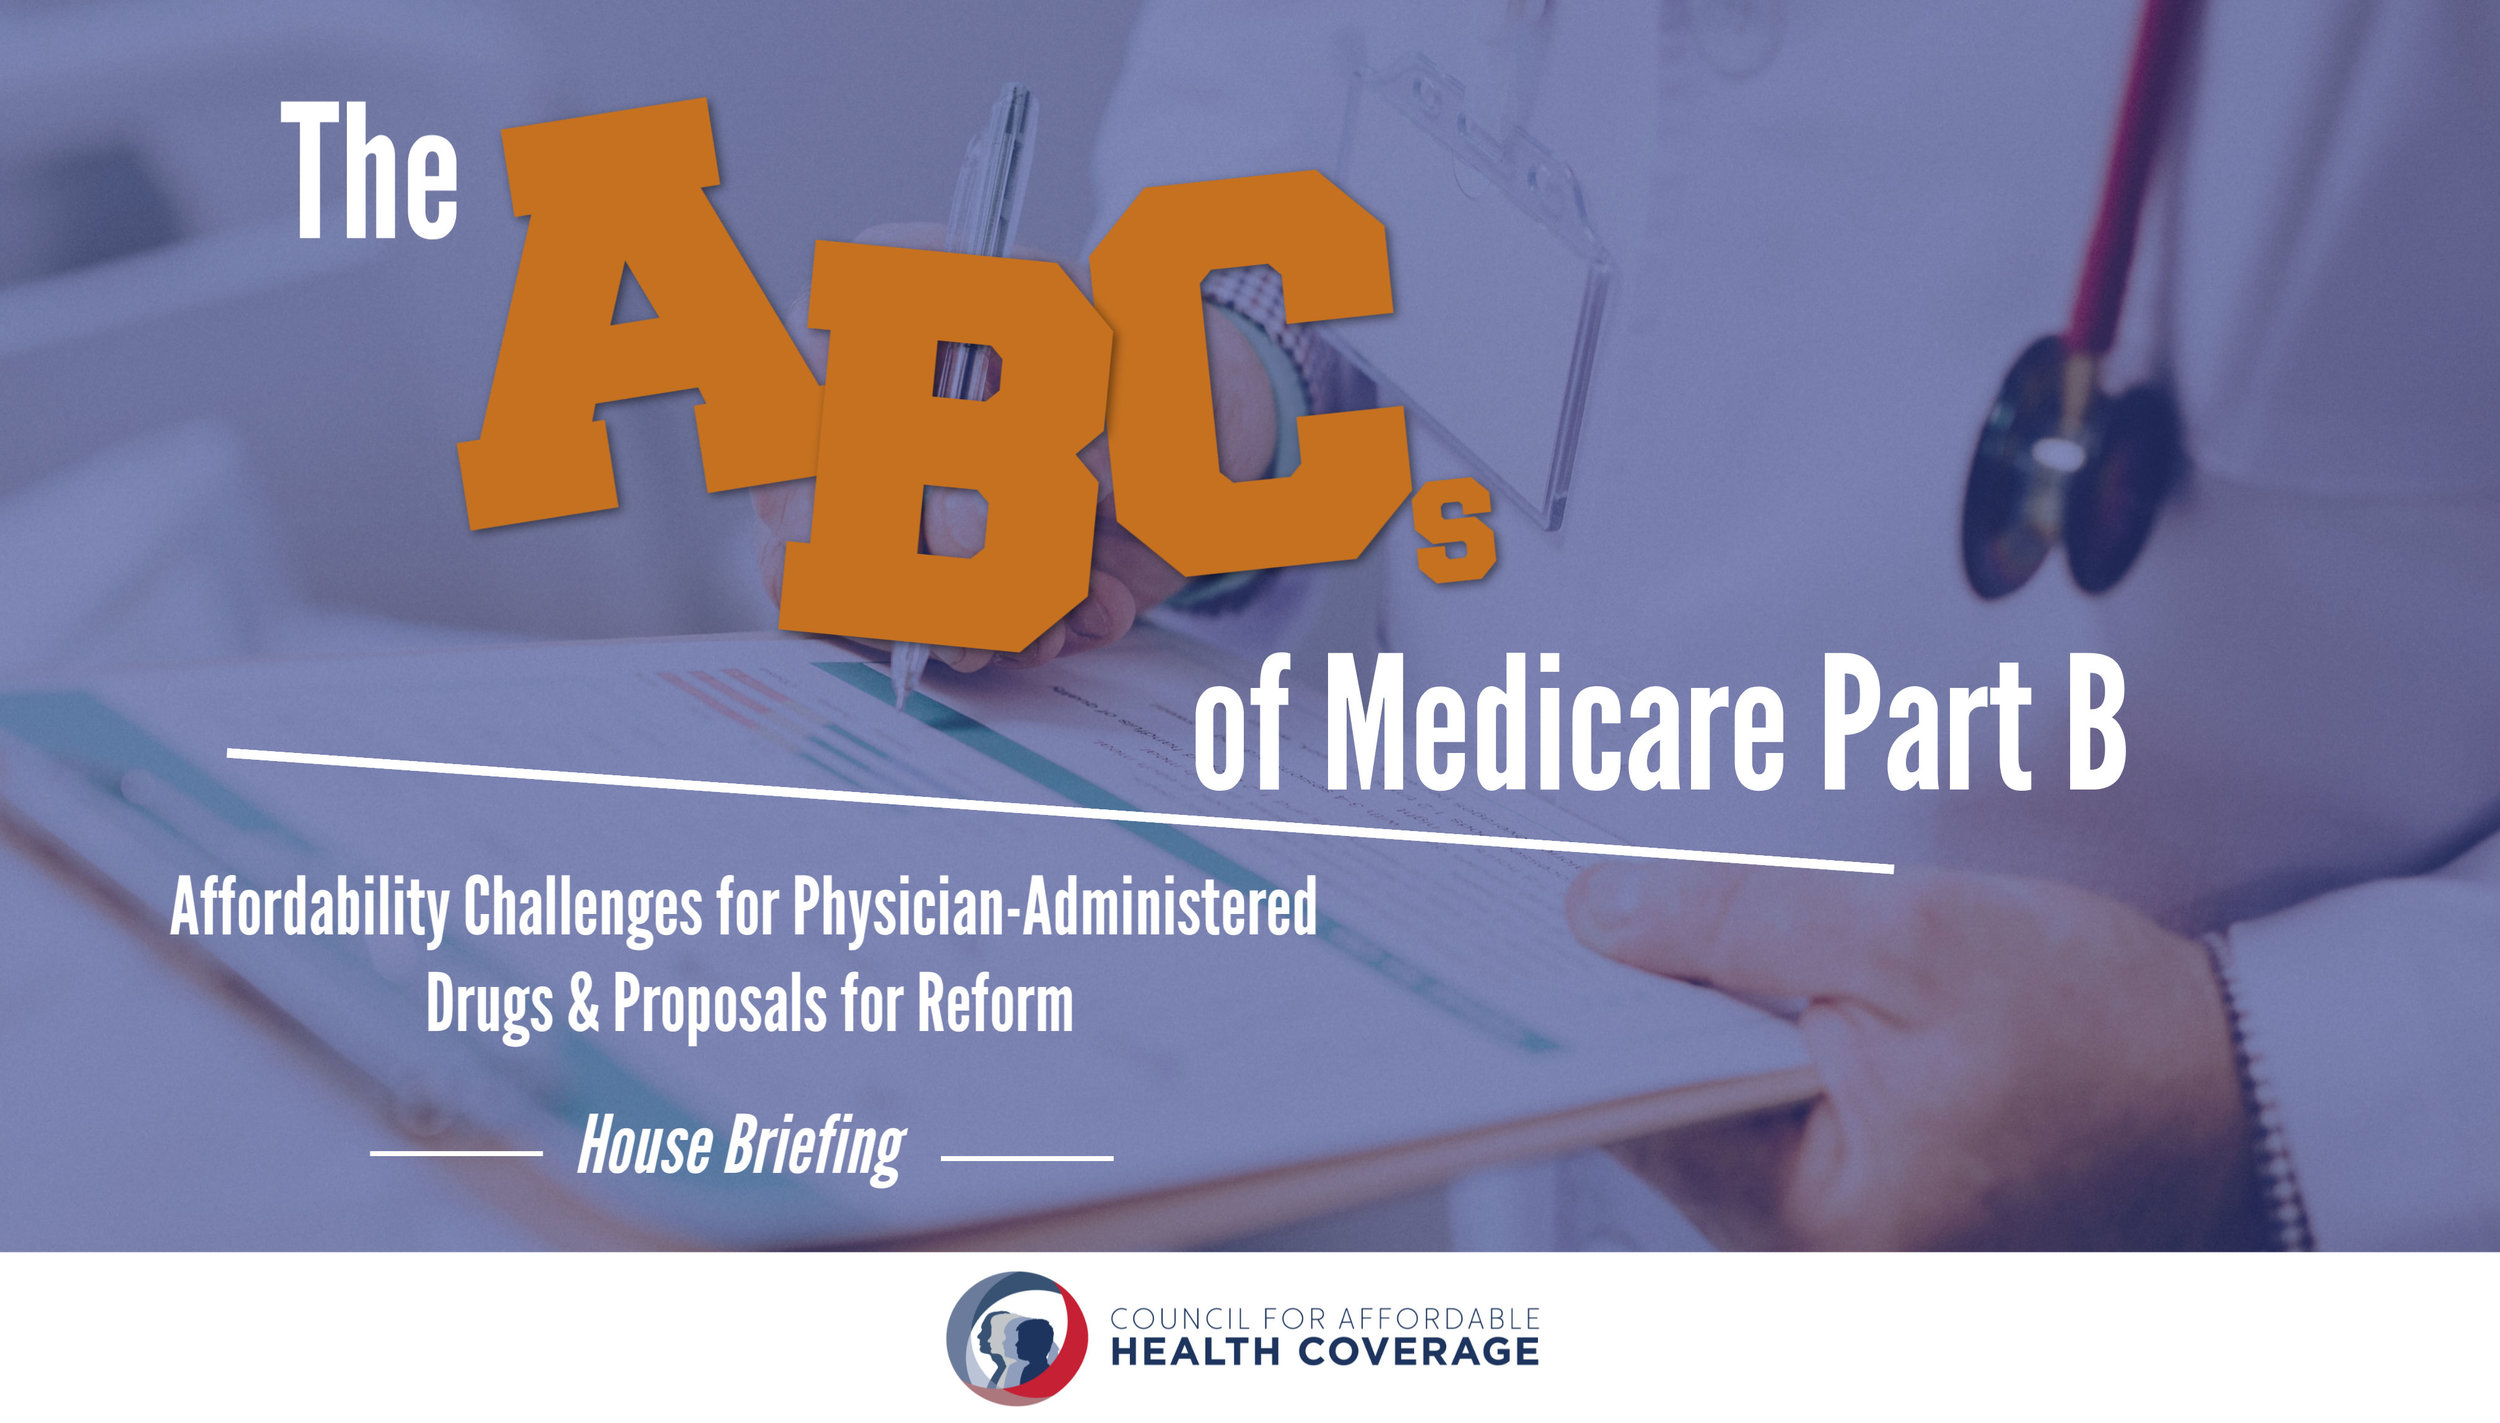 Medicare Part B Briefing - ALT 2.jpg